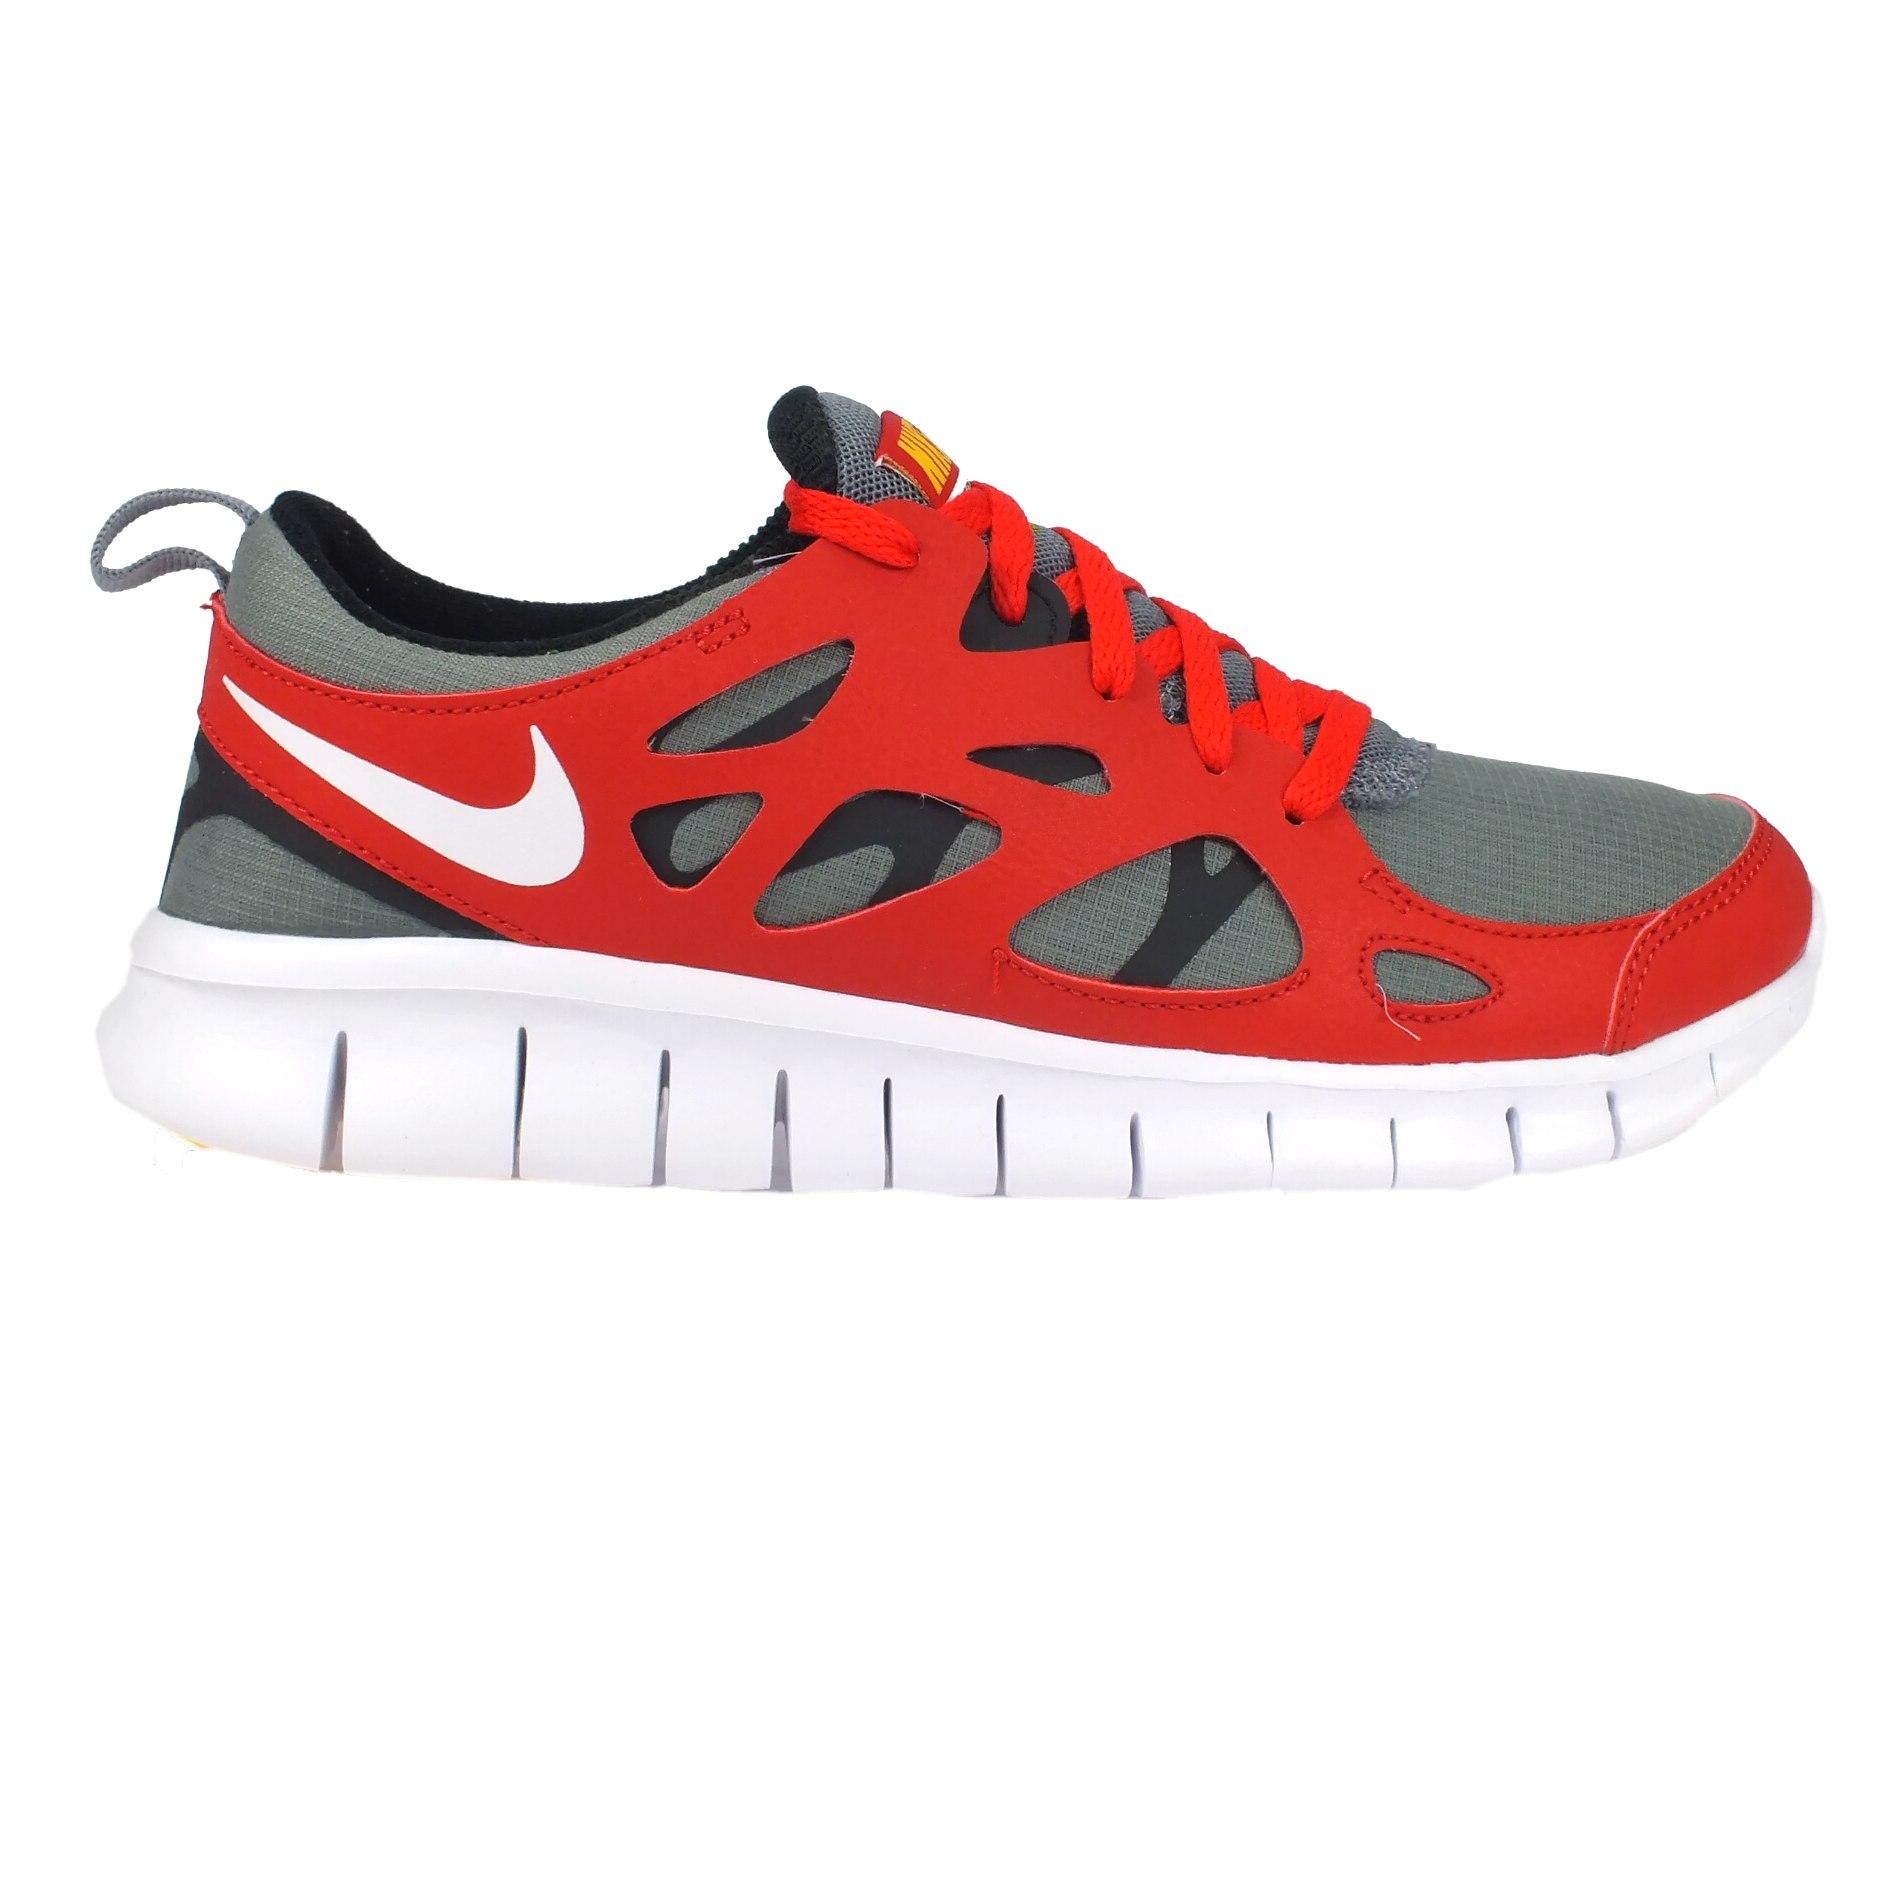 Nike Free Rn 2016 Idealo